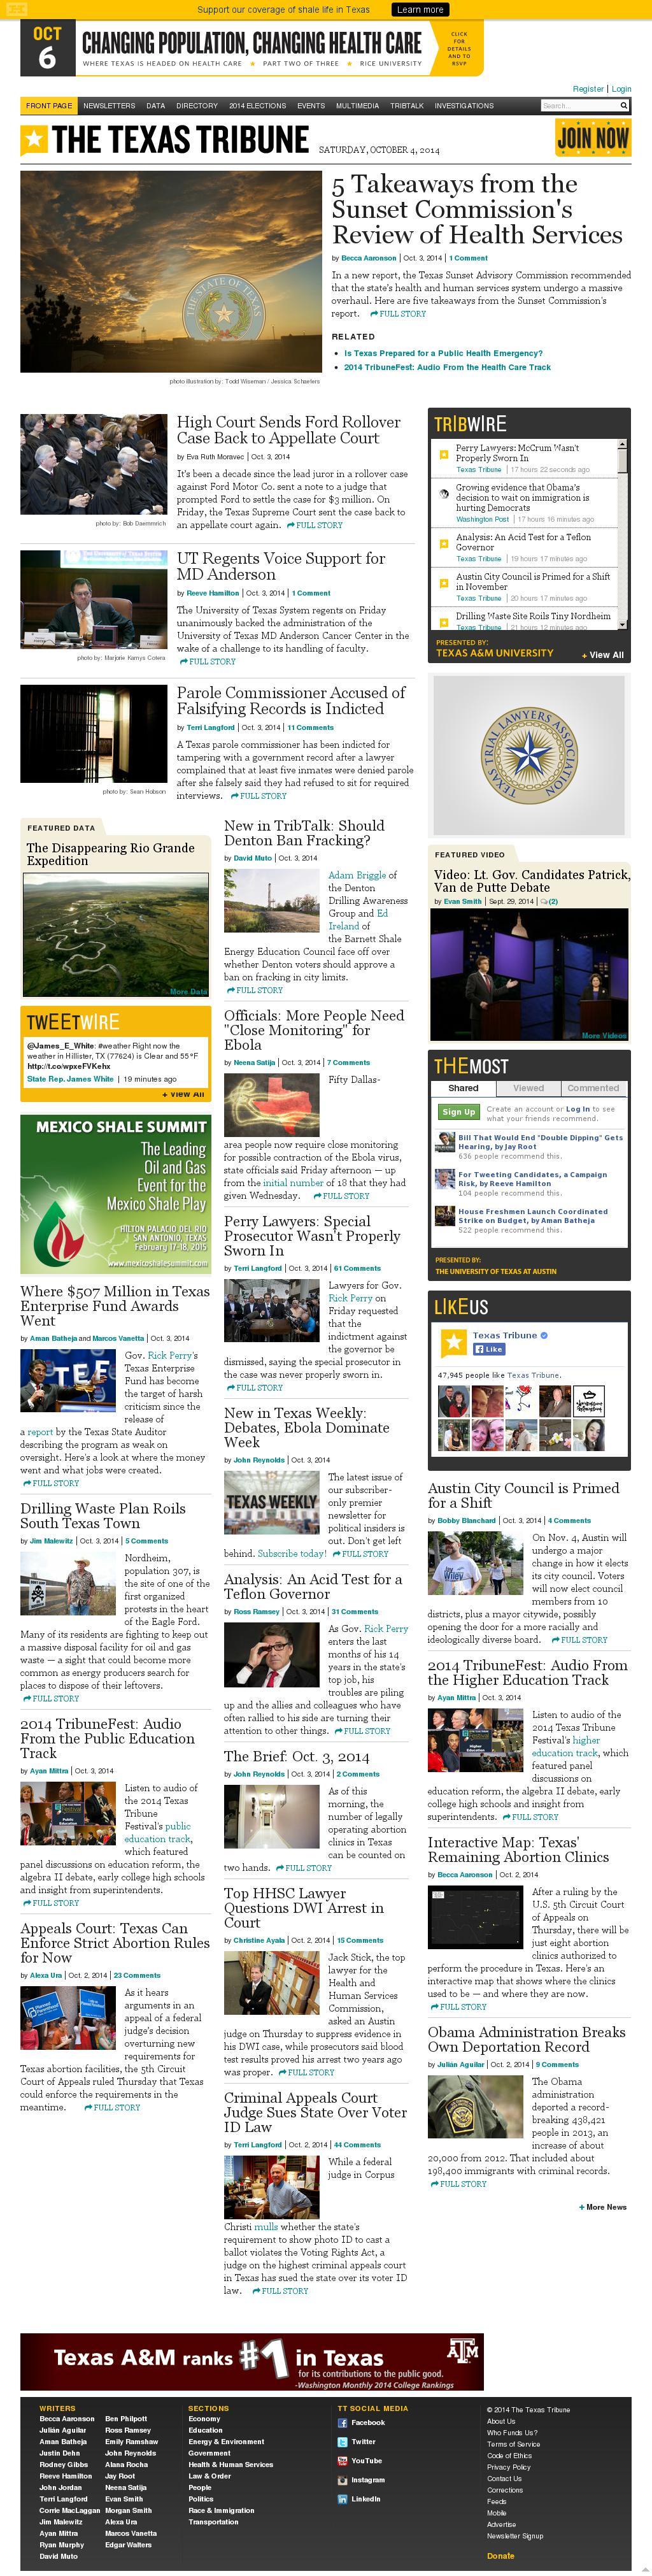 The Texas Tribune at Saturday Oct. 4, 2014, 10:17 a.m. UTC